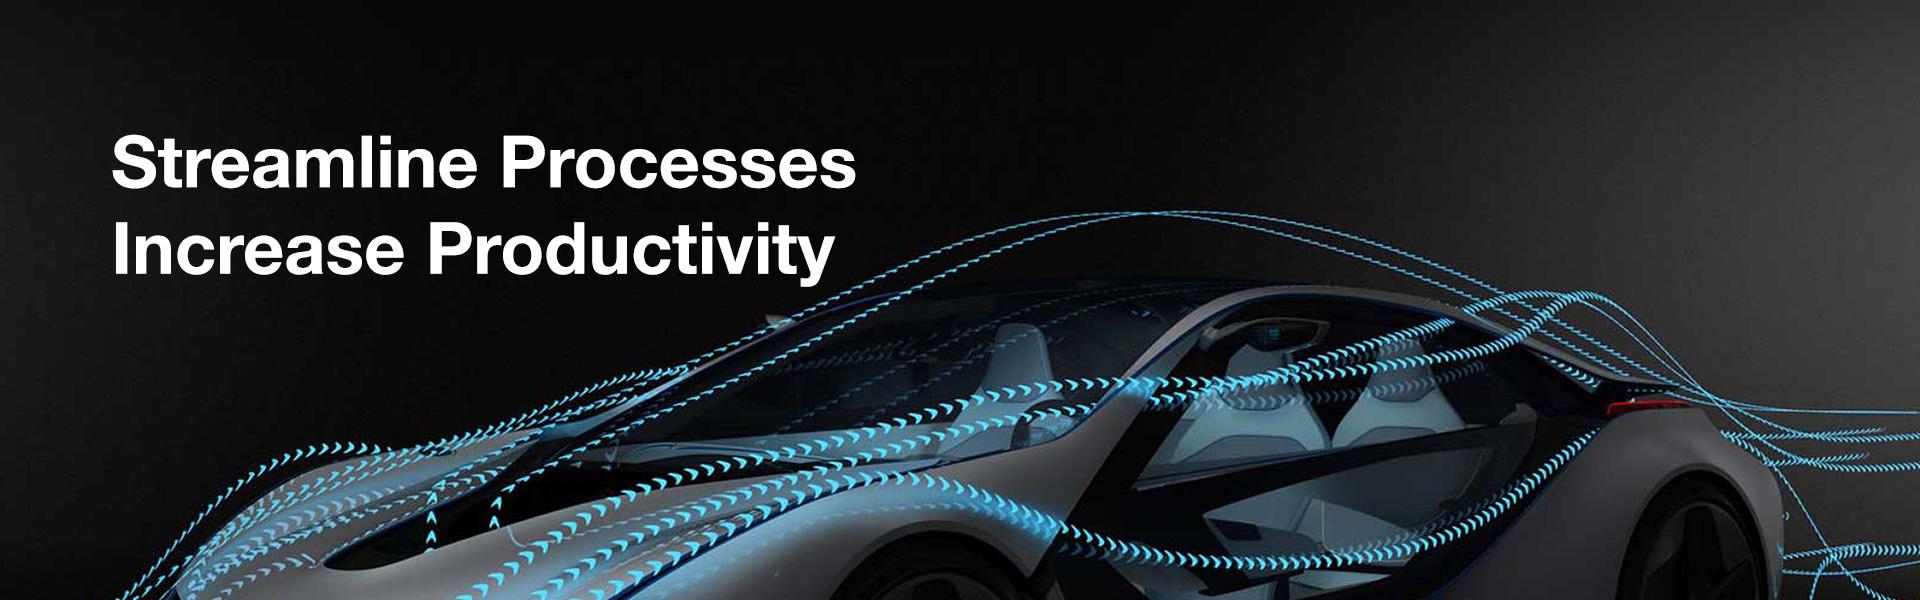 Streamline Processes   Increase Productivity